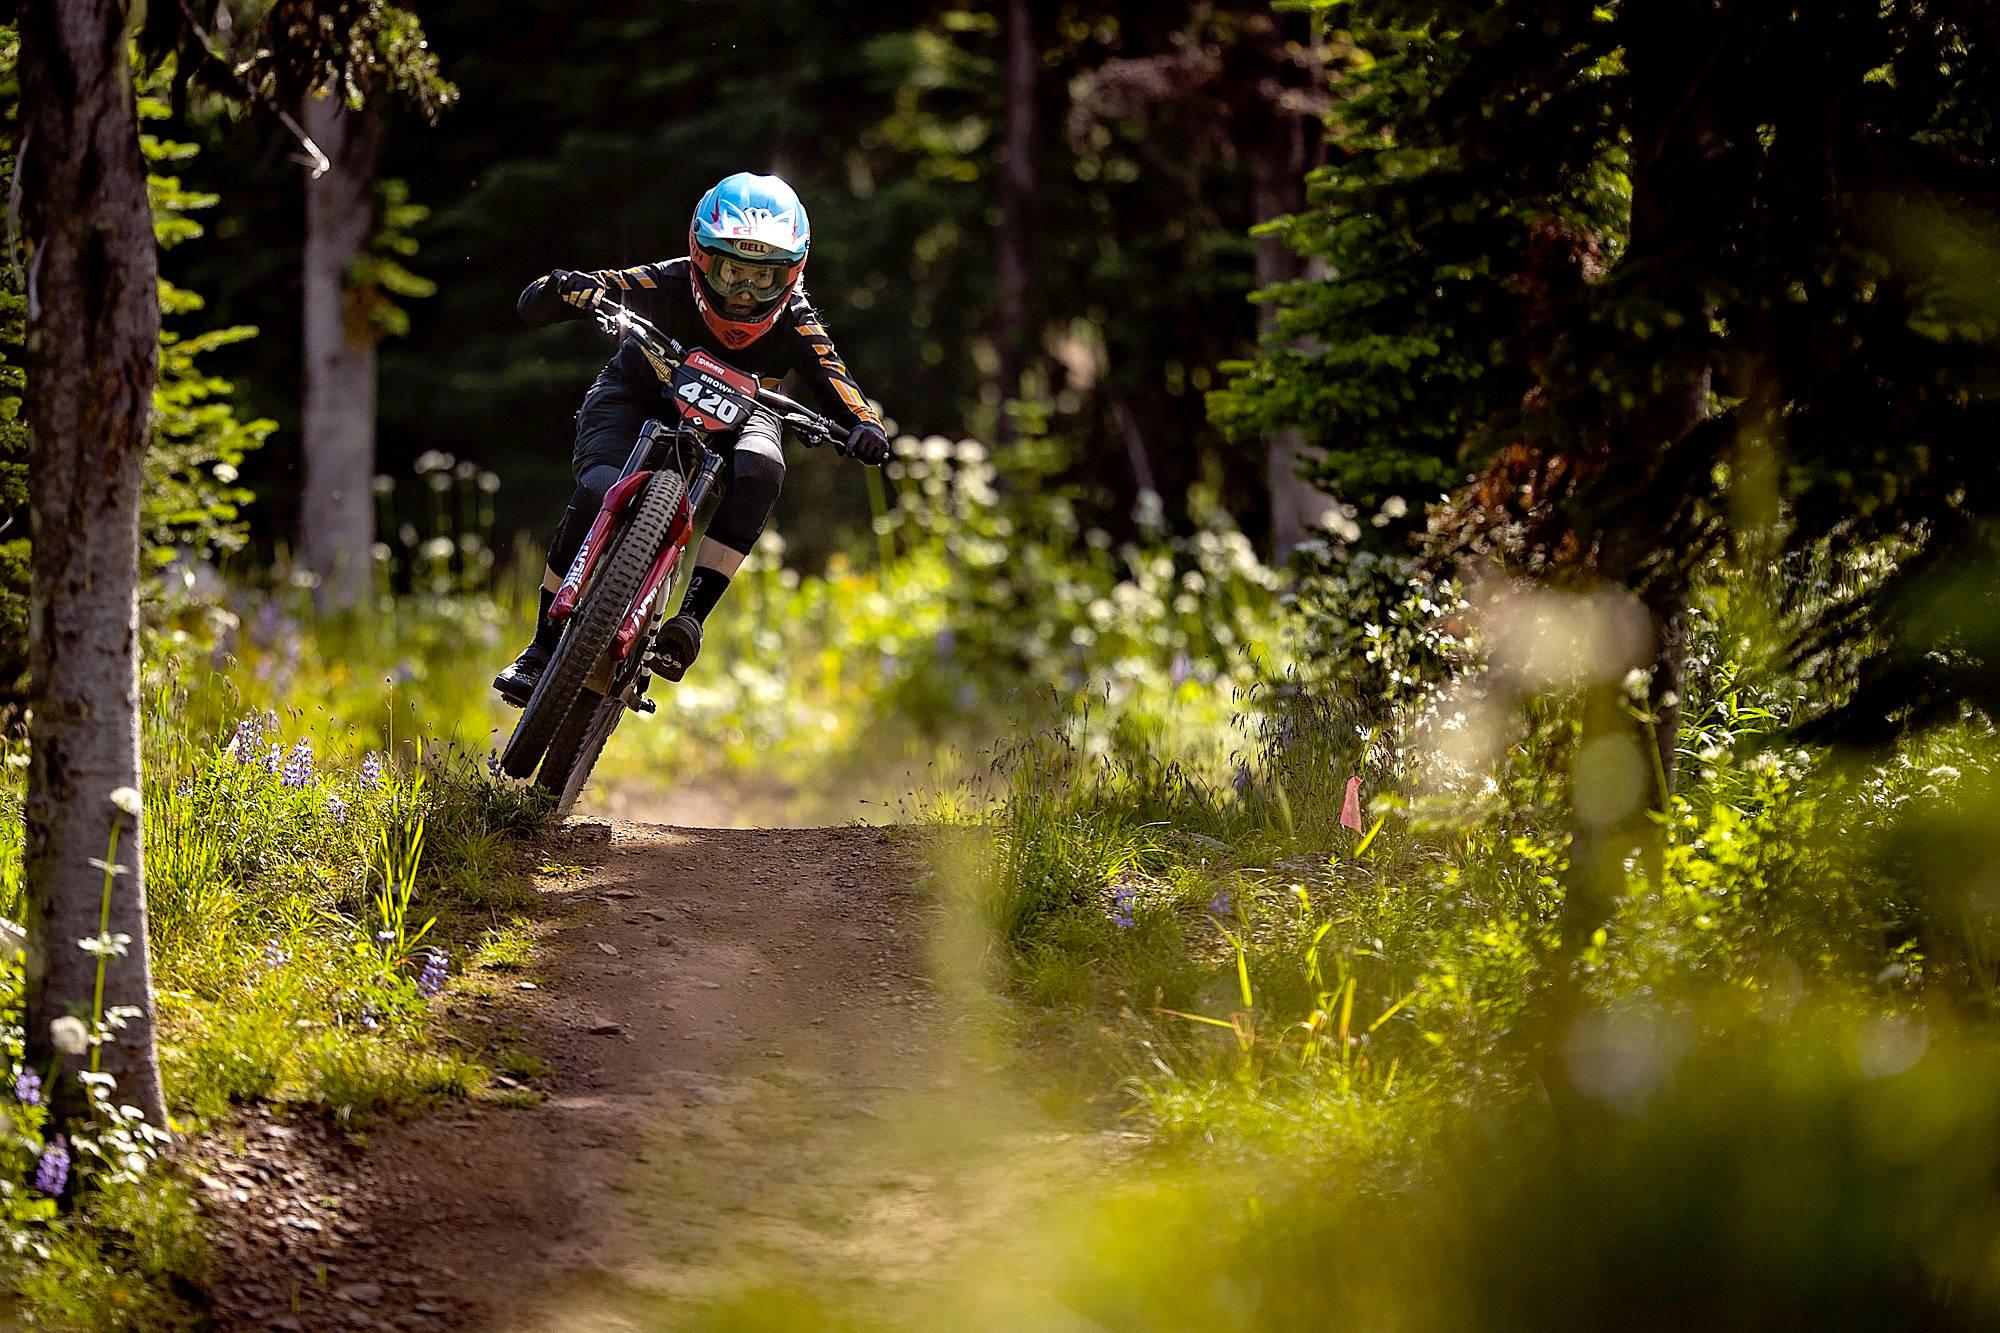 Casey Brown riding Trek at SilverStar Mountain Resort during CLIF Crankworx Tuesday, July 28. (Clint Trahan photo)